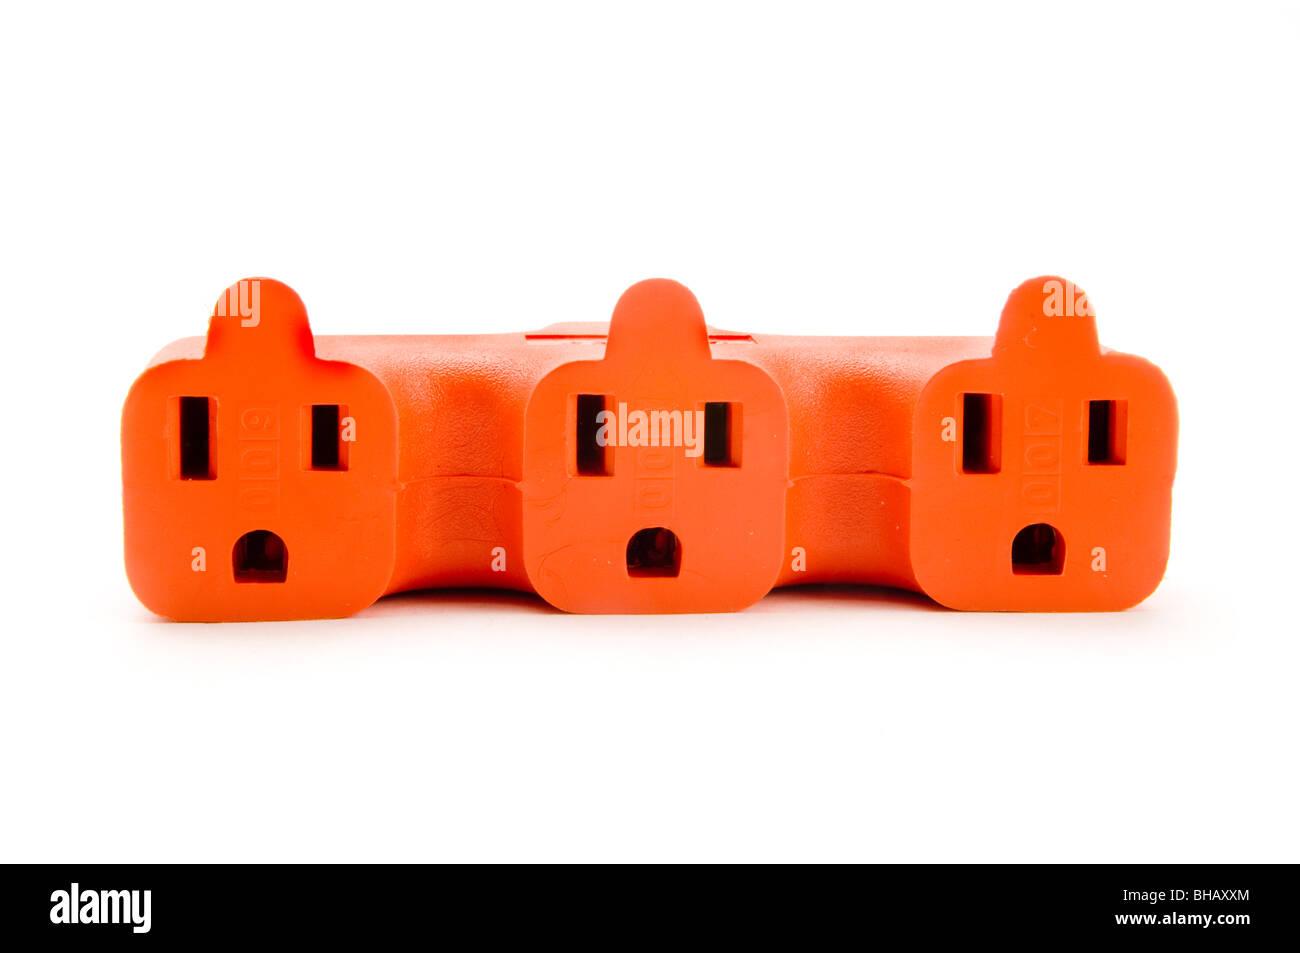 adapter plug - Stock Image